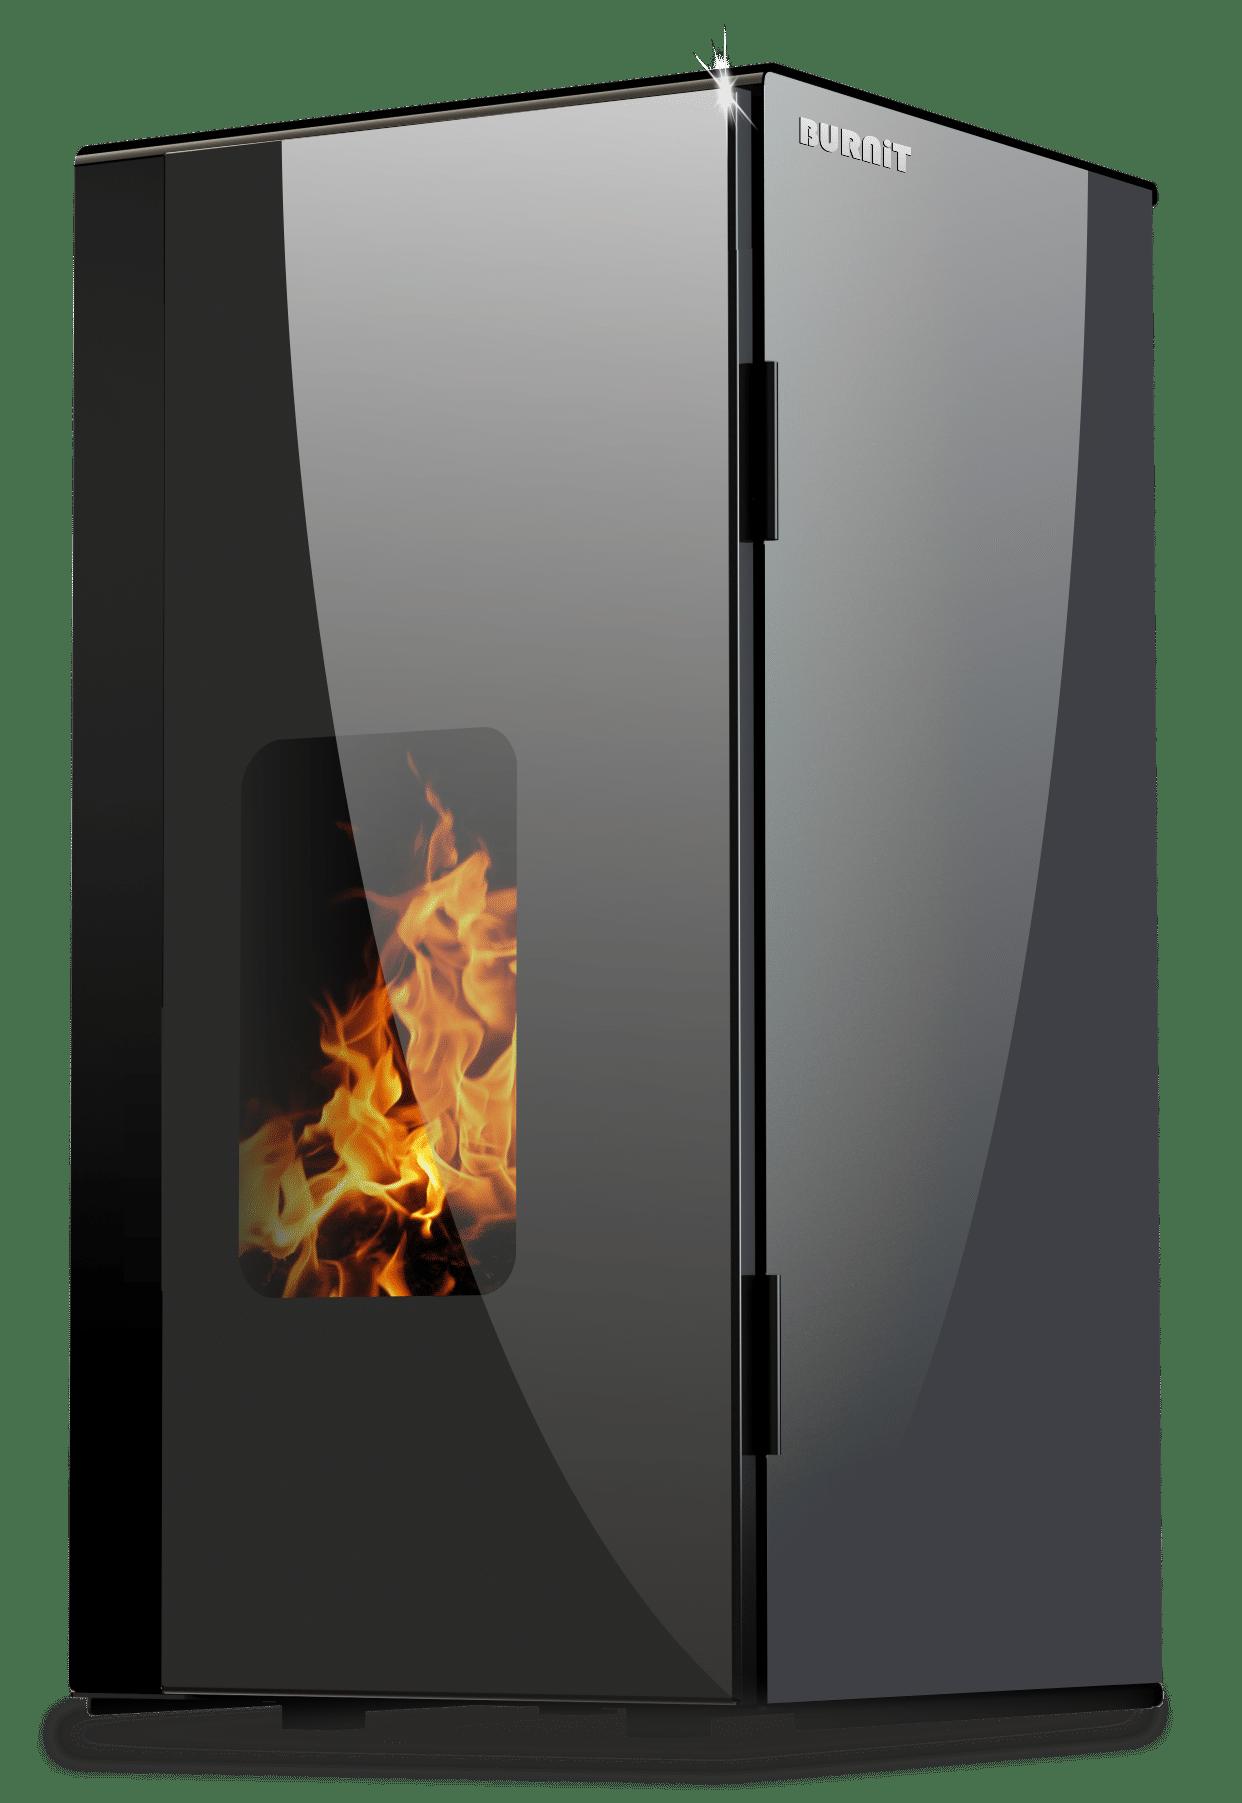 Pellet stove Vision_Anthracite Grey_Burnit